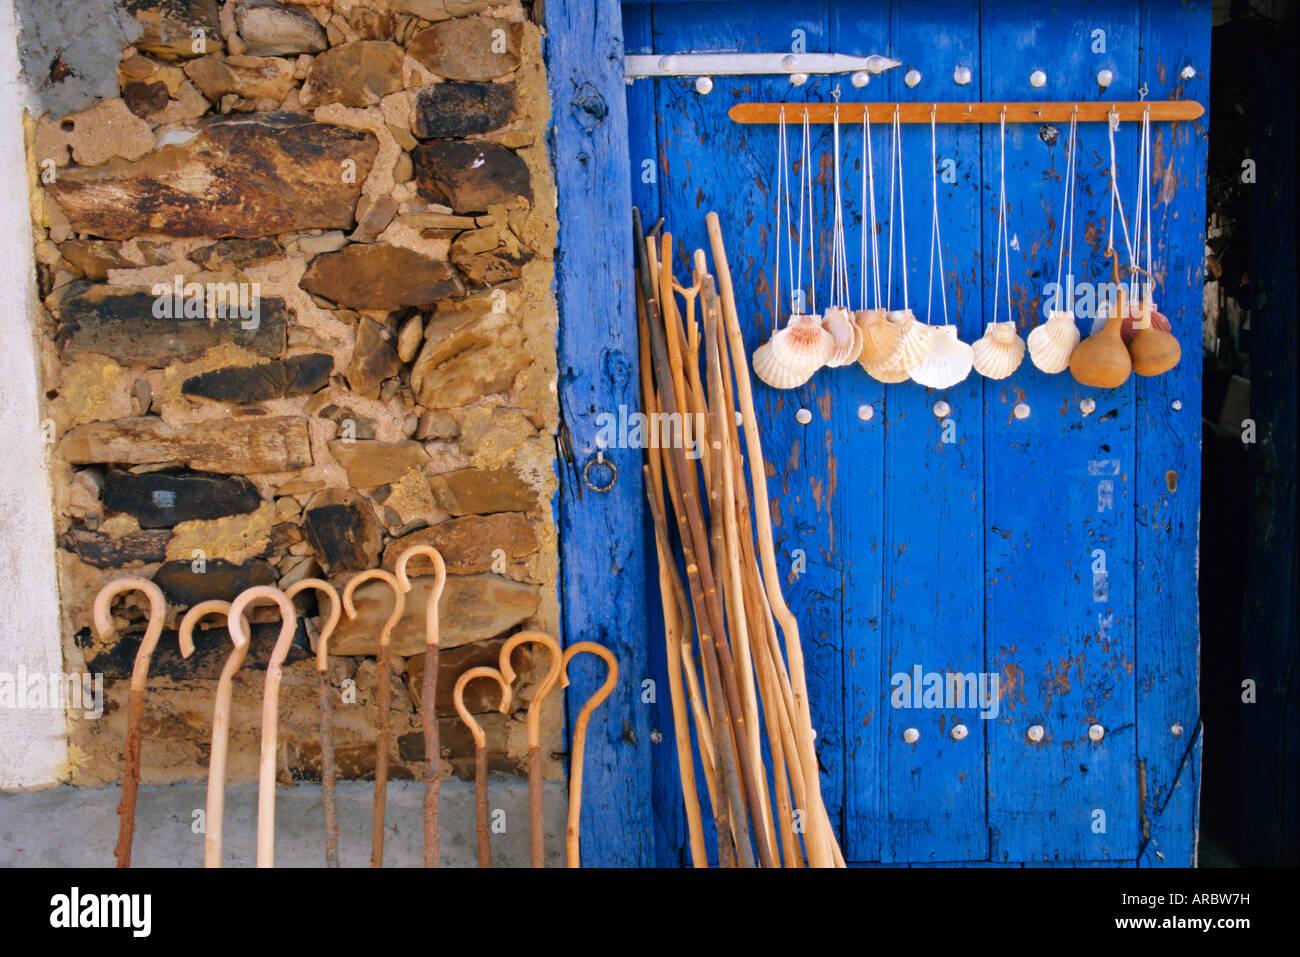 El Camino Pilgrimage to Santiago de Compostela, scallop shells and walking sticks, Galicia, Spain, Europe - Stock Image